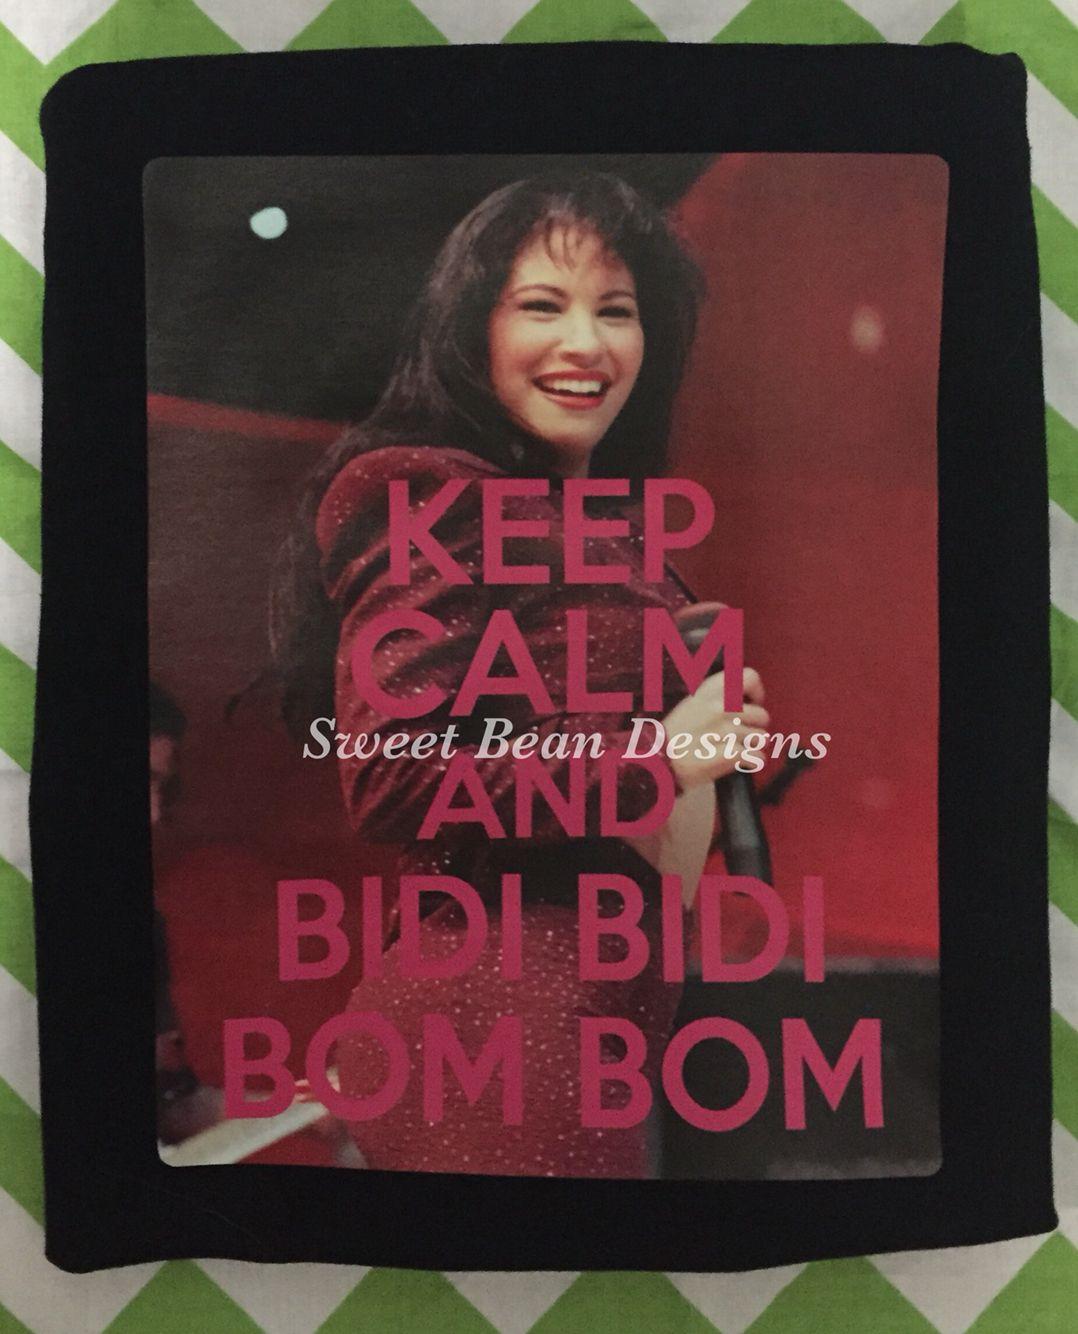 Selena Bidi Bidi Bom Bom Keep Calm Shirt Www Facebook Com Sweetbeandesigns Keep Calm Shirts Vinyl Crafts Graphic Tshirt